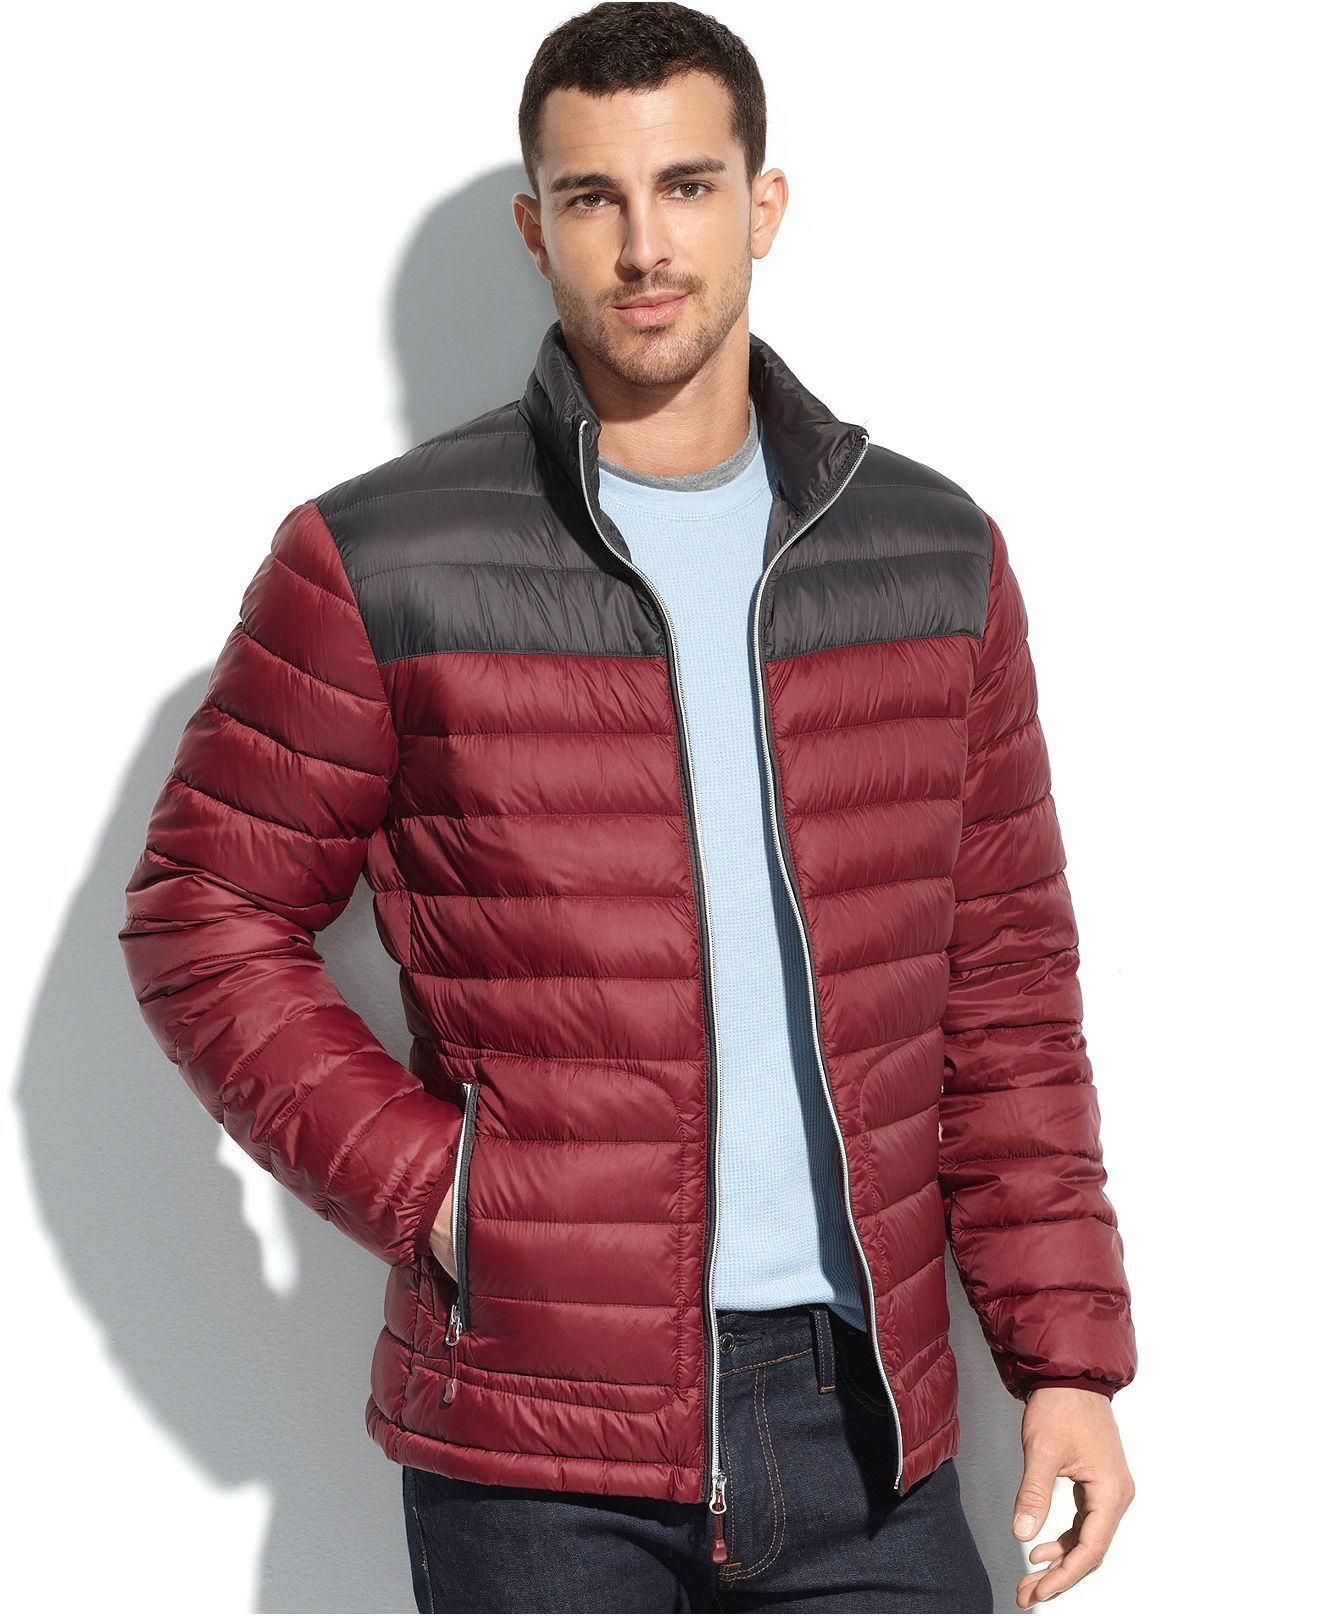 Nautica Jacket Packable Lightweight Colorblocked Down Puffer Jacket Coats Jackets Men Macy S Mens Puffer Jacket Winter Jackets Mens Jackets [ 1616 x 1320 Pixel ]